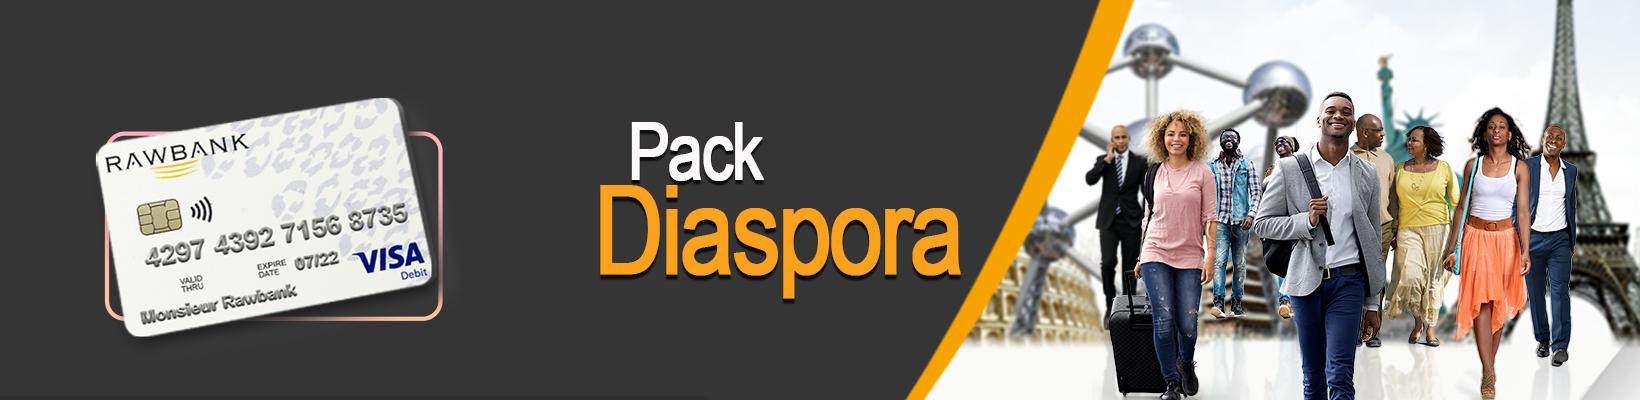 1640x400-Pack-diaspora